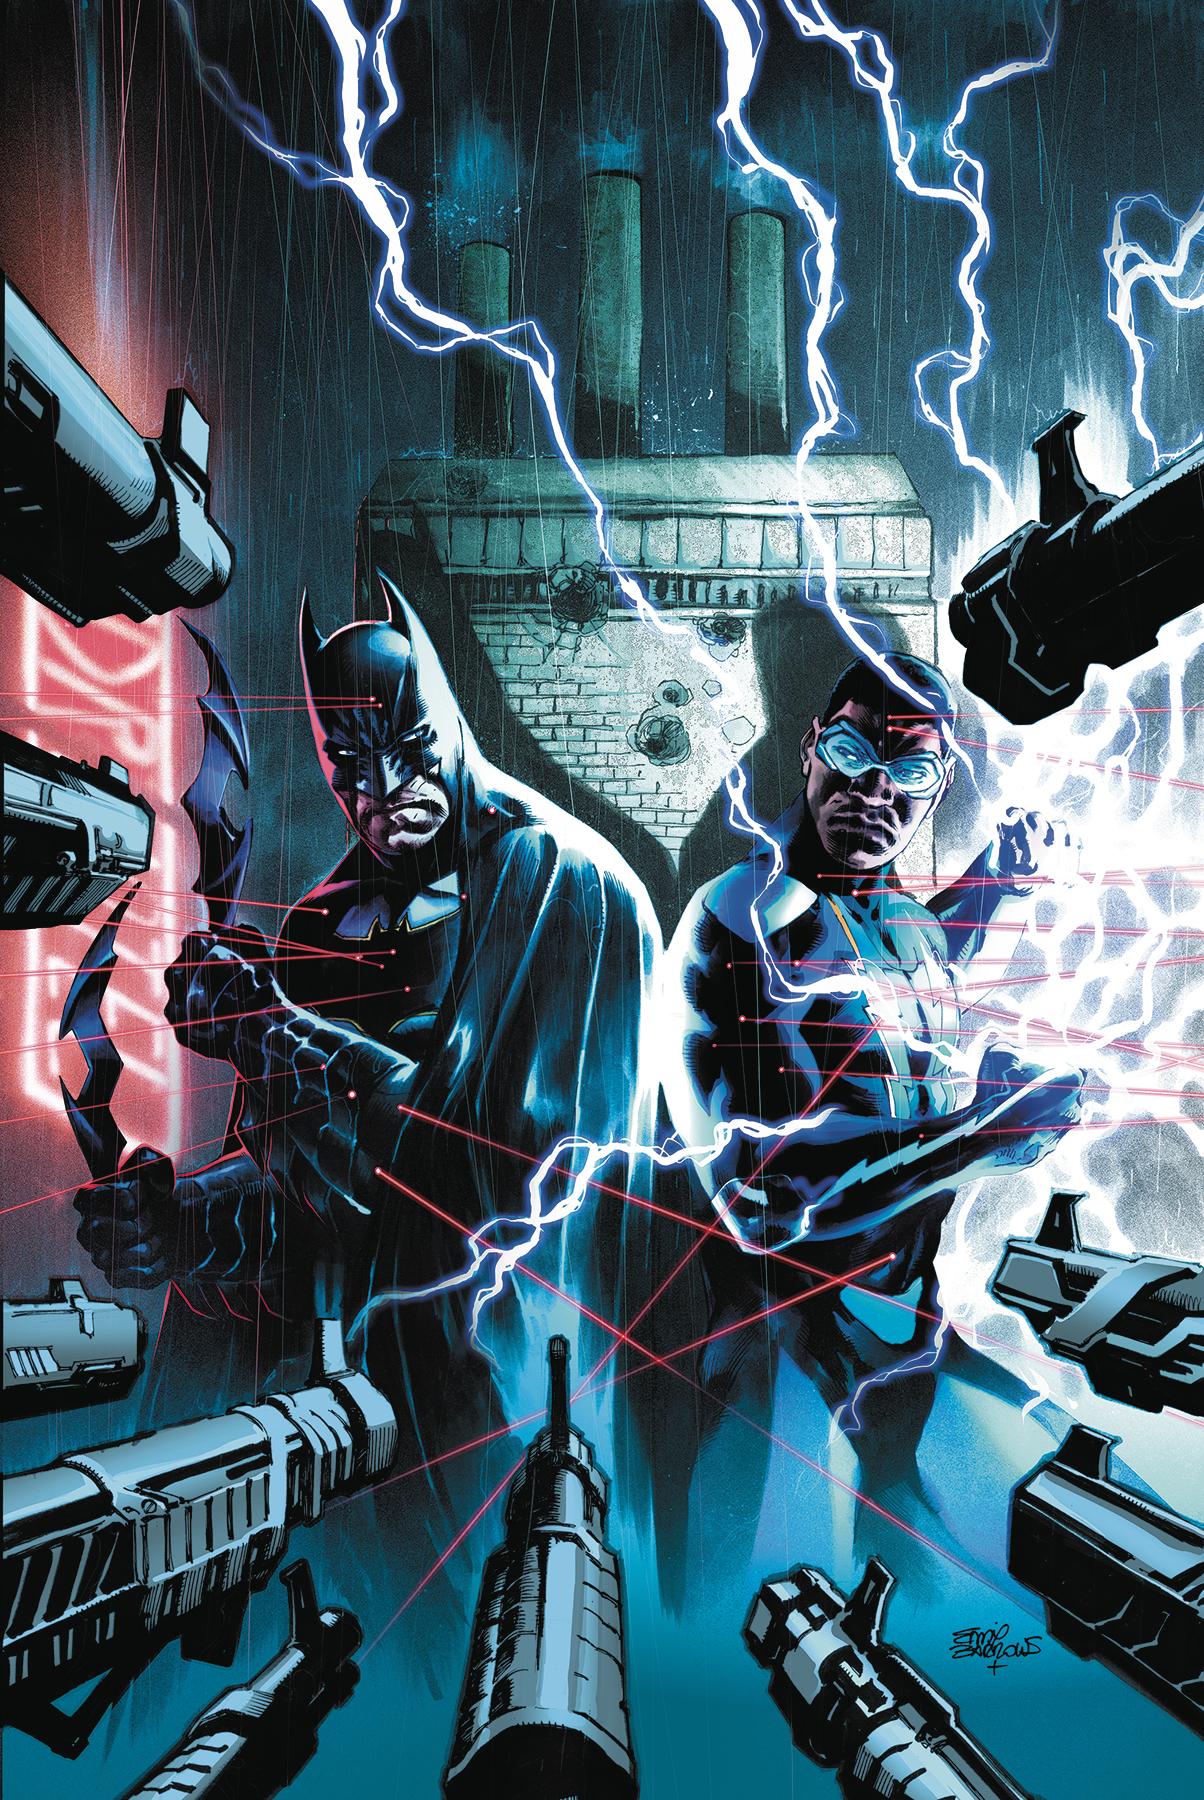 Bryan Hill No Longer Writing Detective Comics 982 Deacon Blackfire Replaces Black Lightning Deacon joseph blackfire is a sinister preacher and a villain in the dc comics. bryan hill no longer writing detective